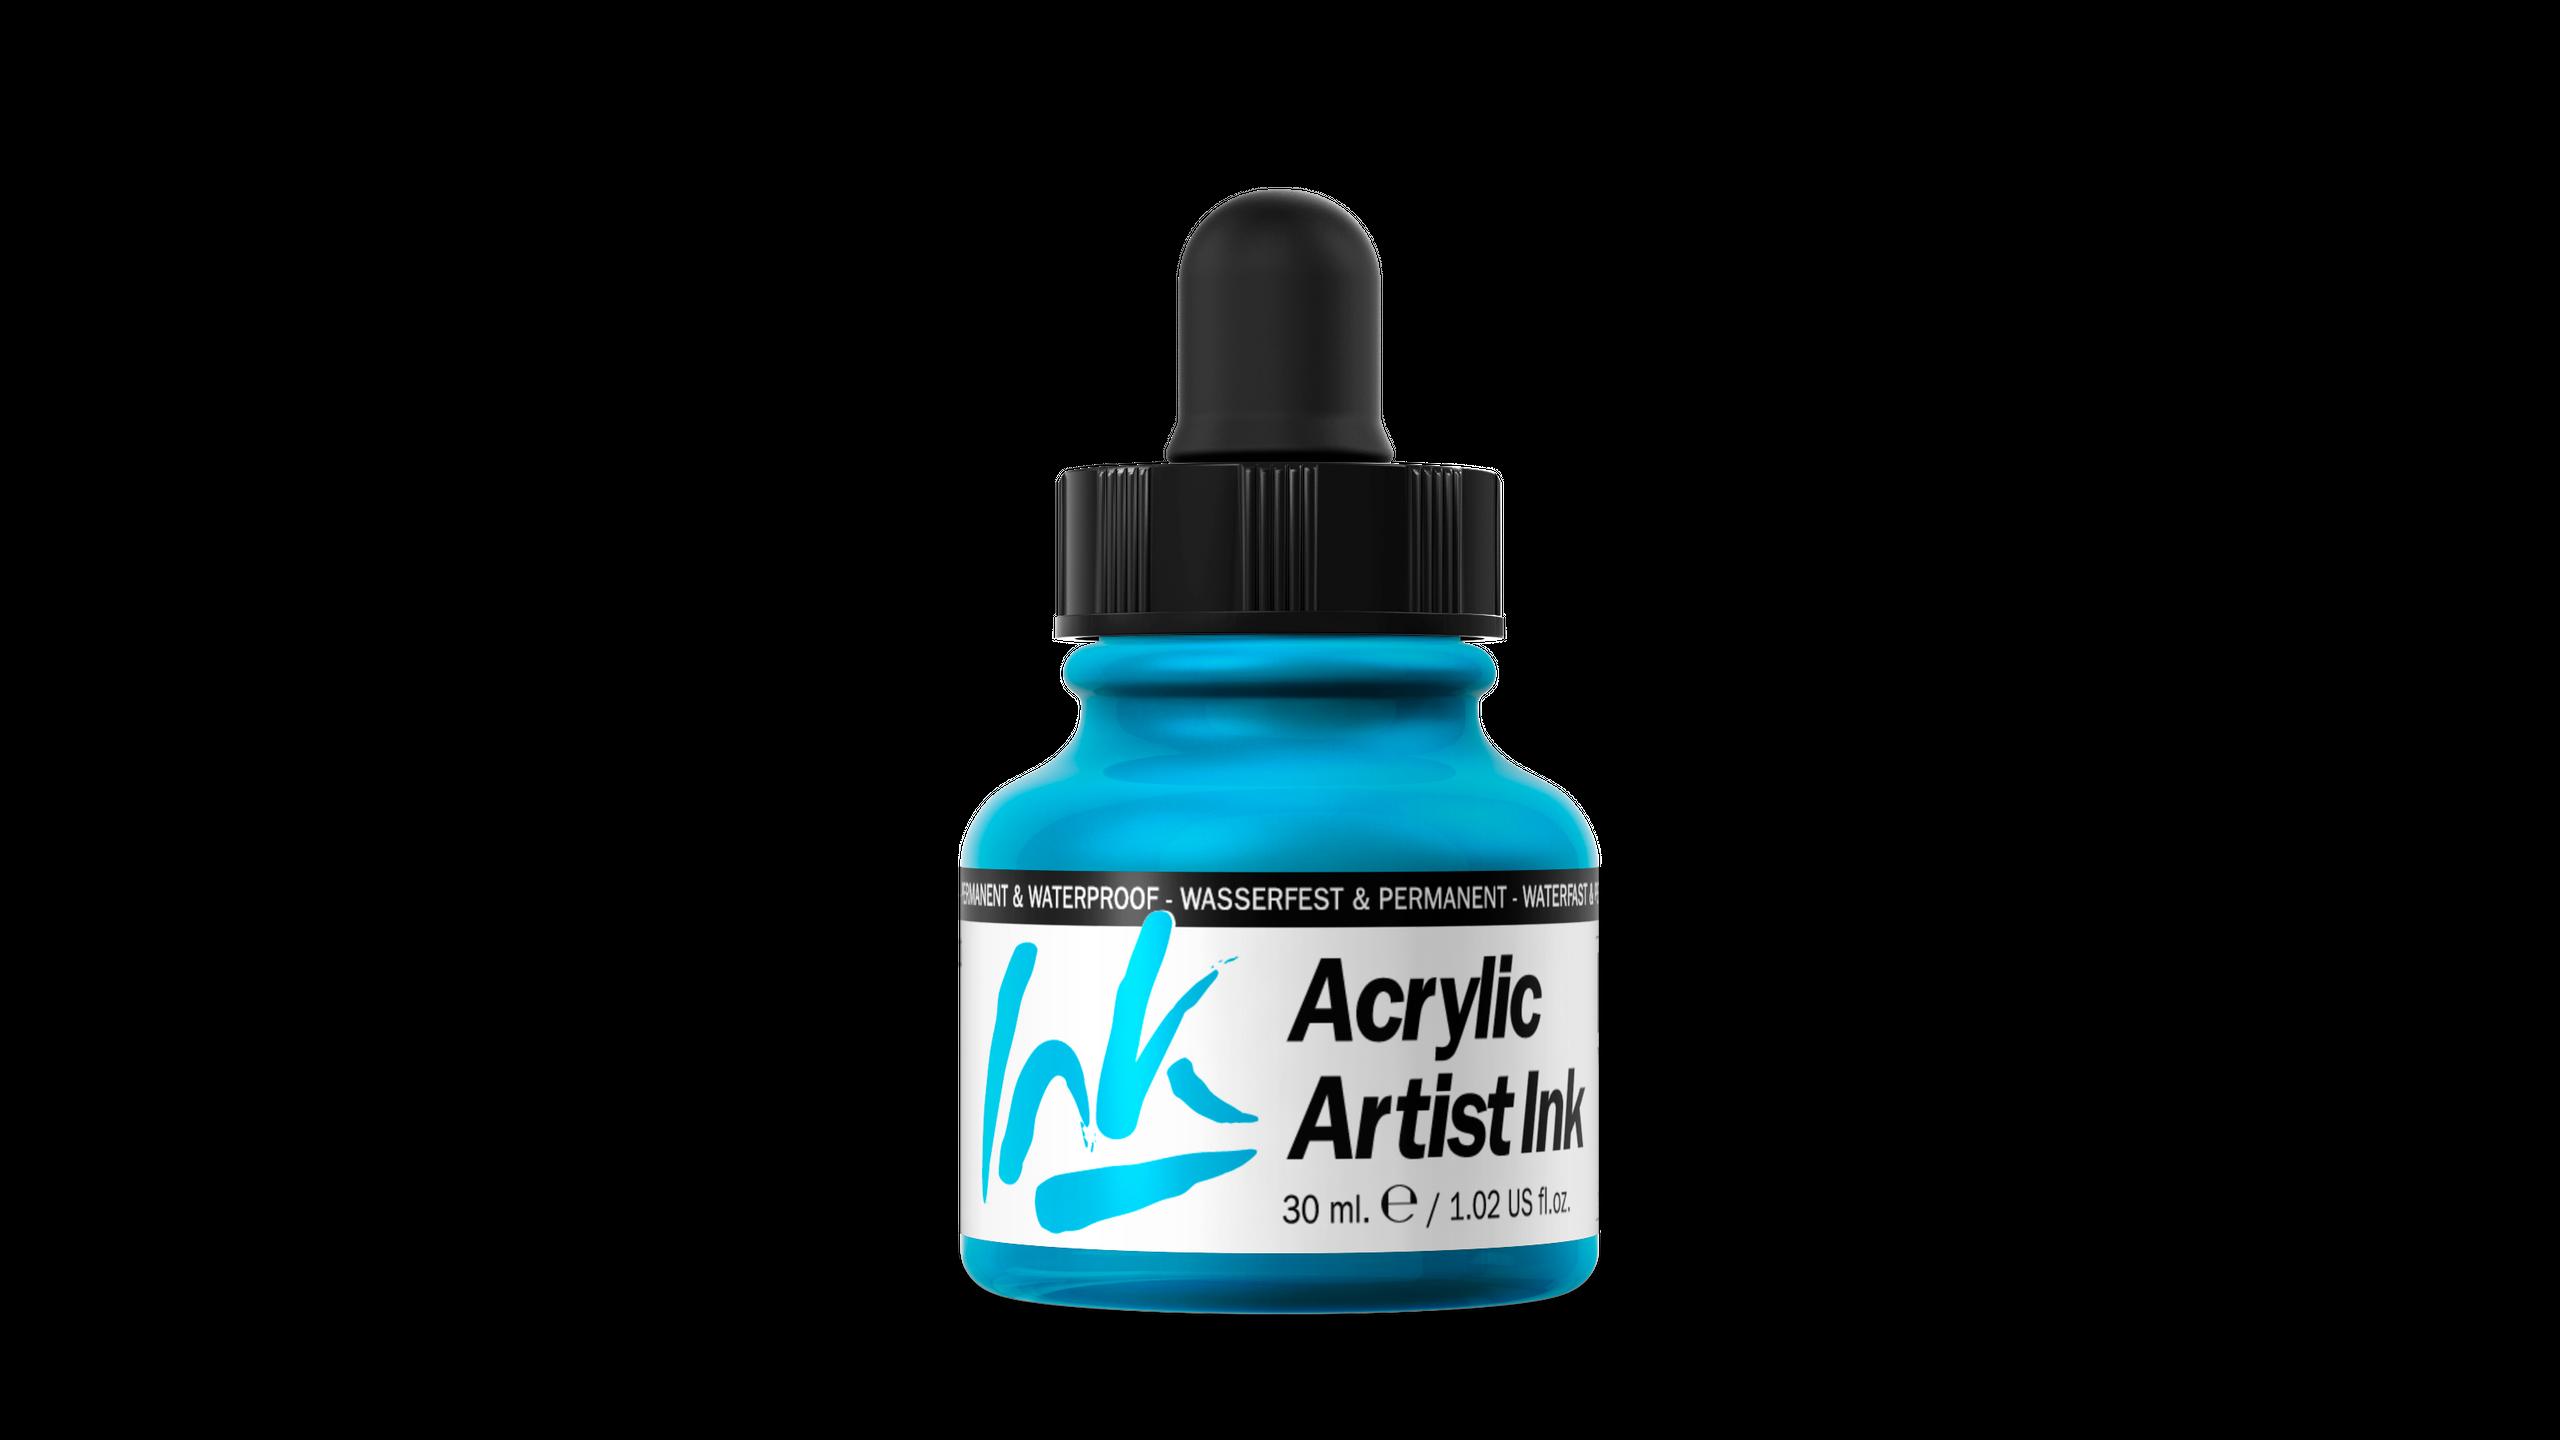 Acrylic Artist Inks Vallejo 60010 Light Blue 30ml Airbrush Tinte